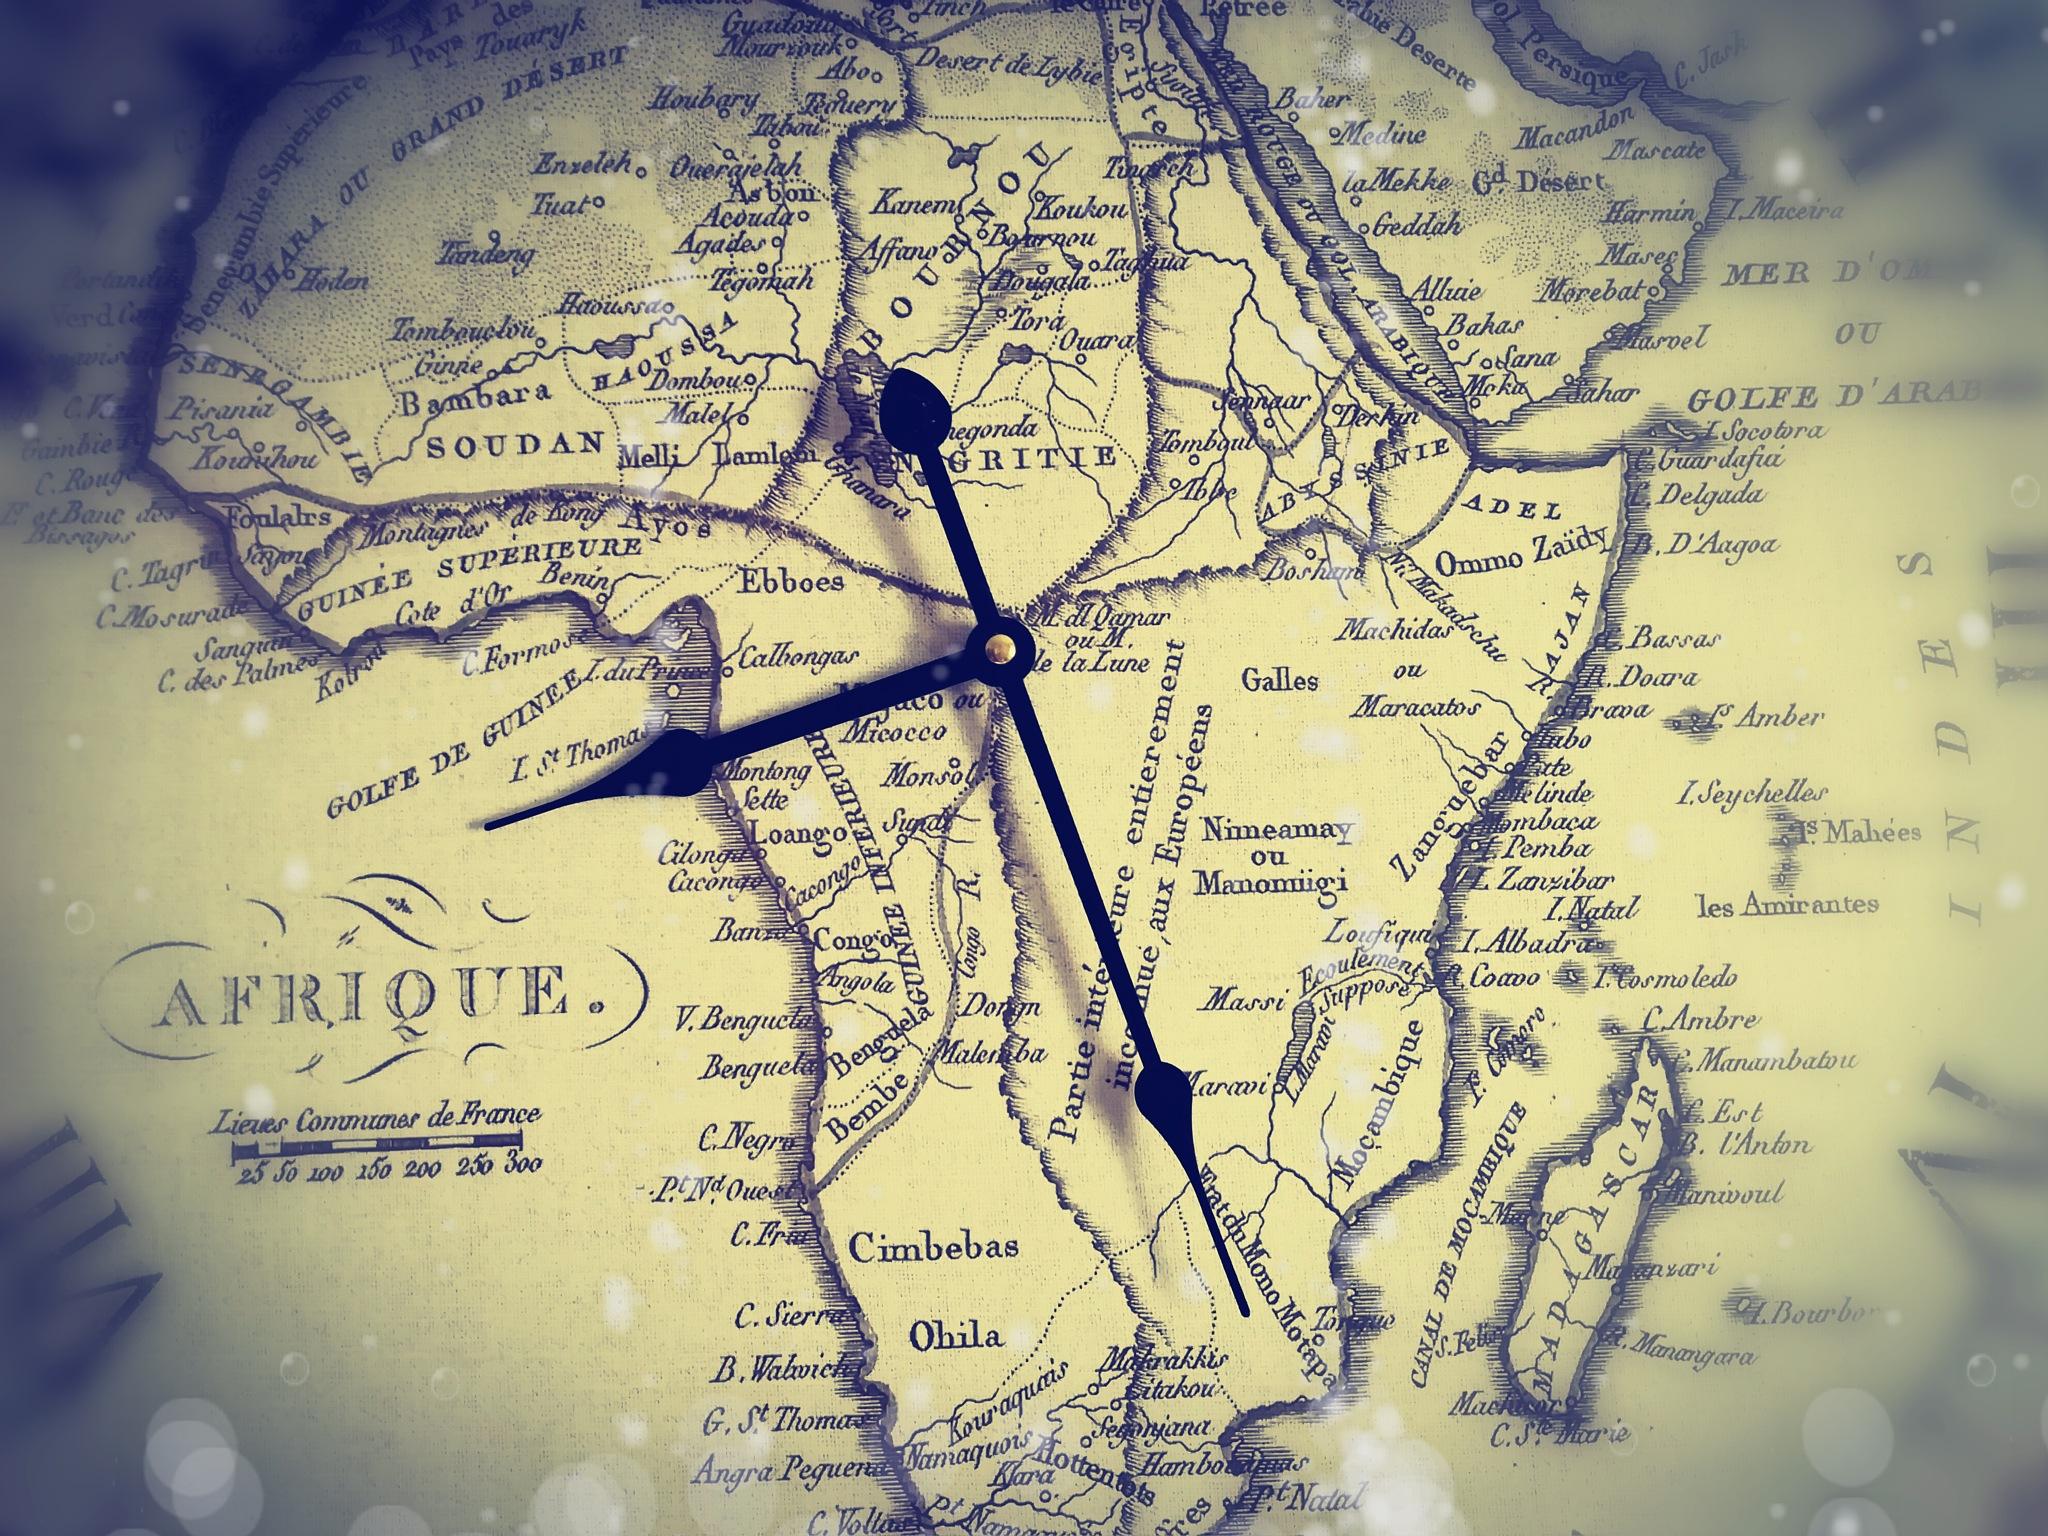 African time by DeborahBooth